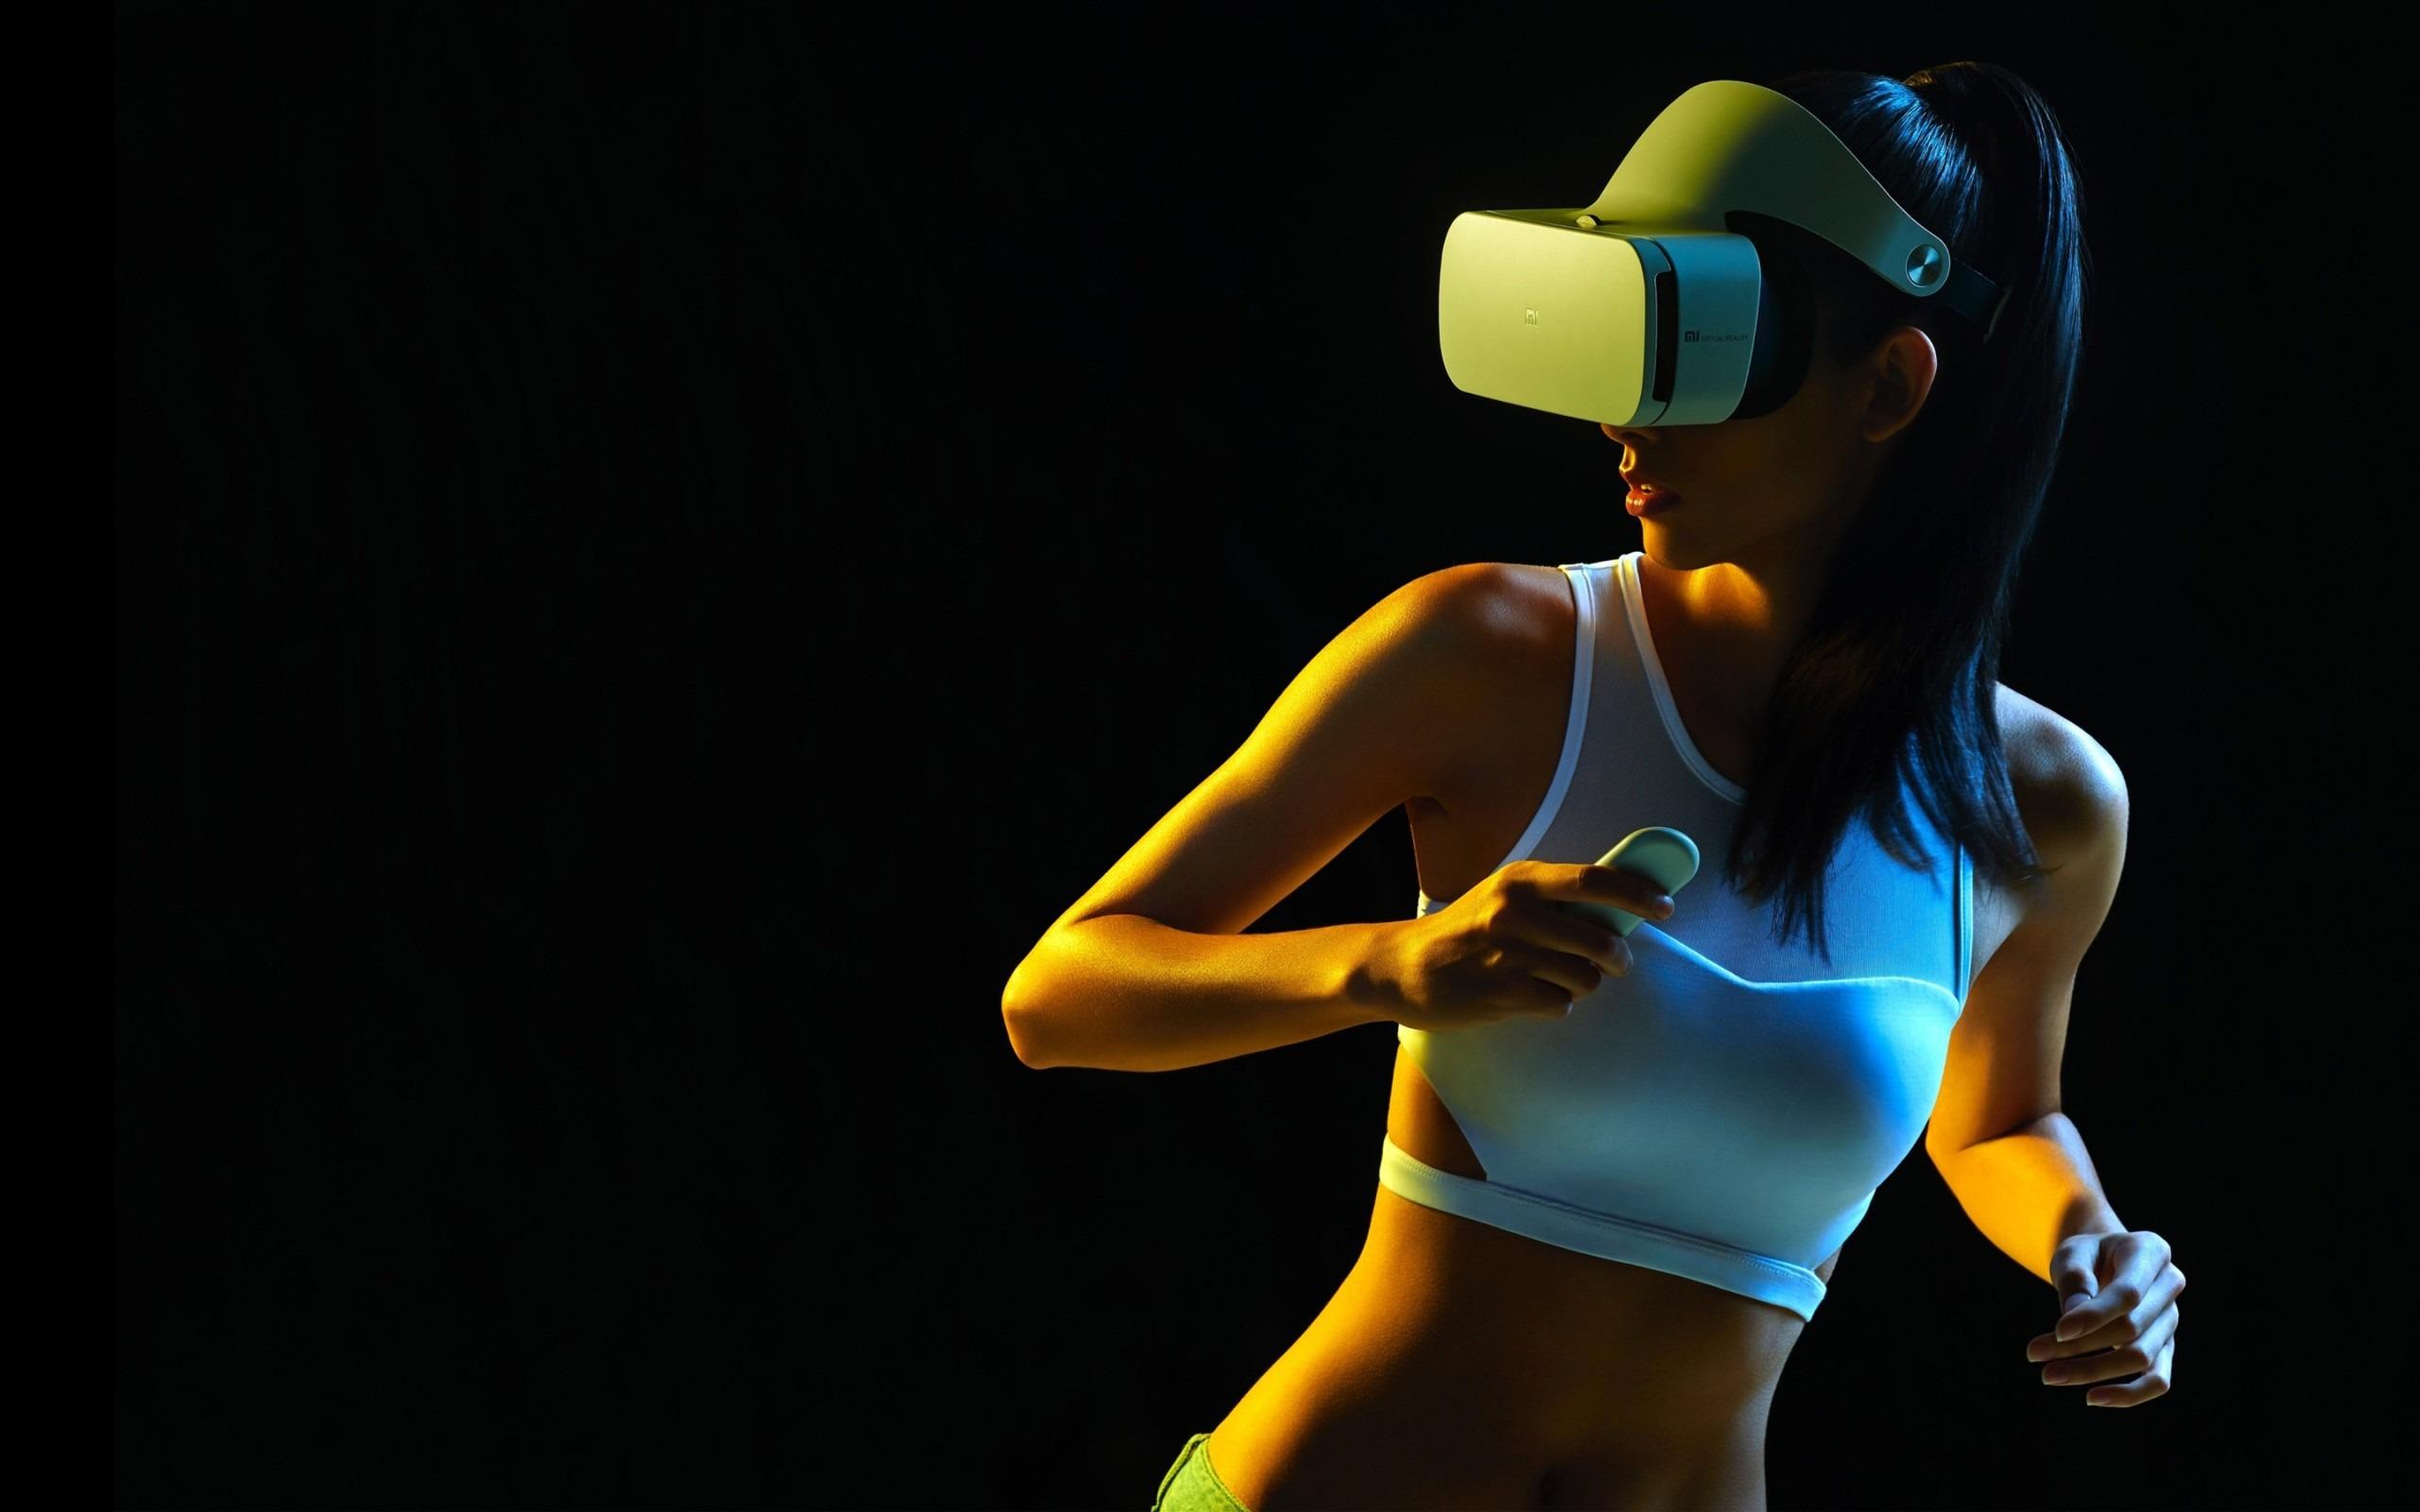 China Virtual Reality VR HD Wallpaper Mi Wallpaper2016113 Original Resolution 2560x1600